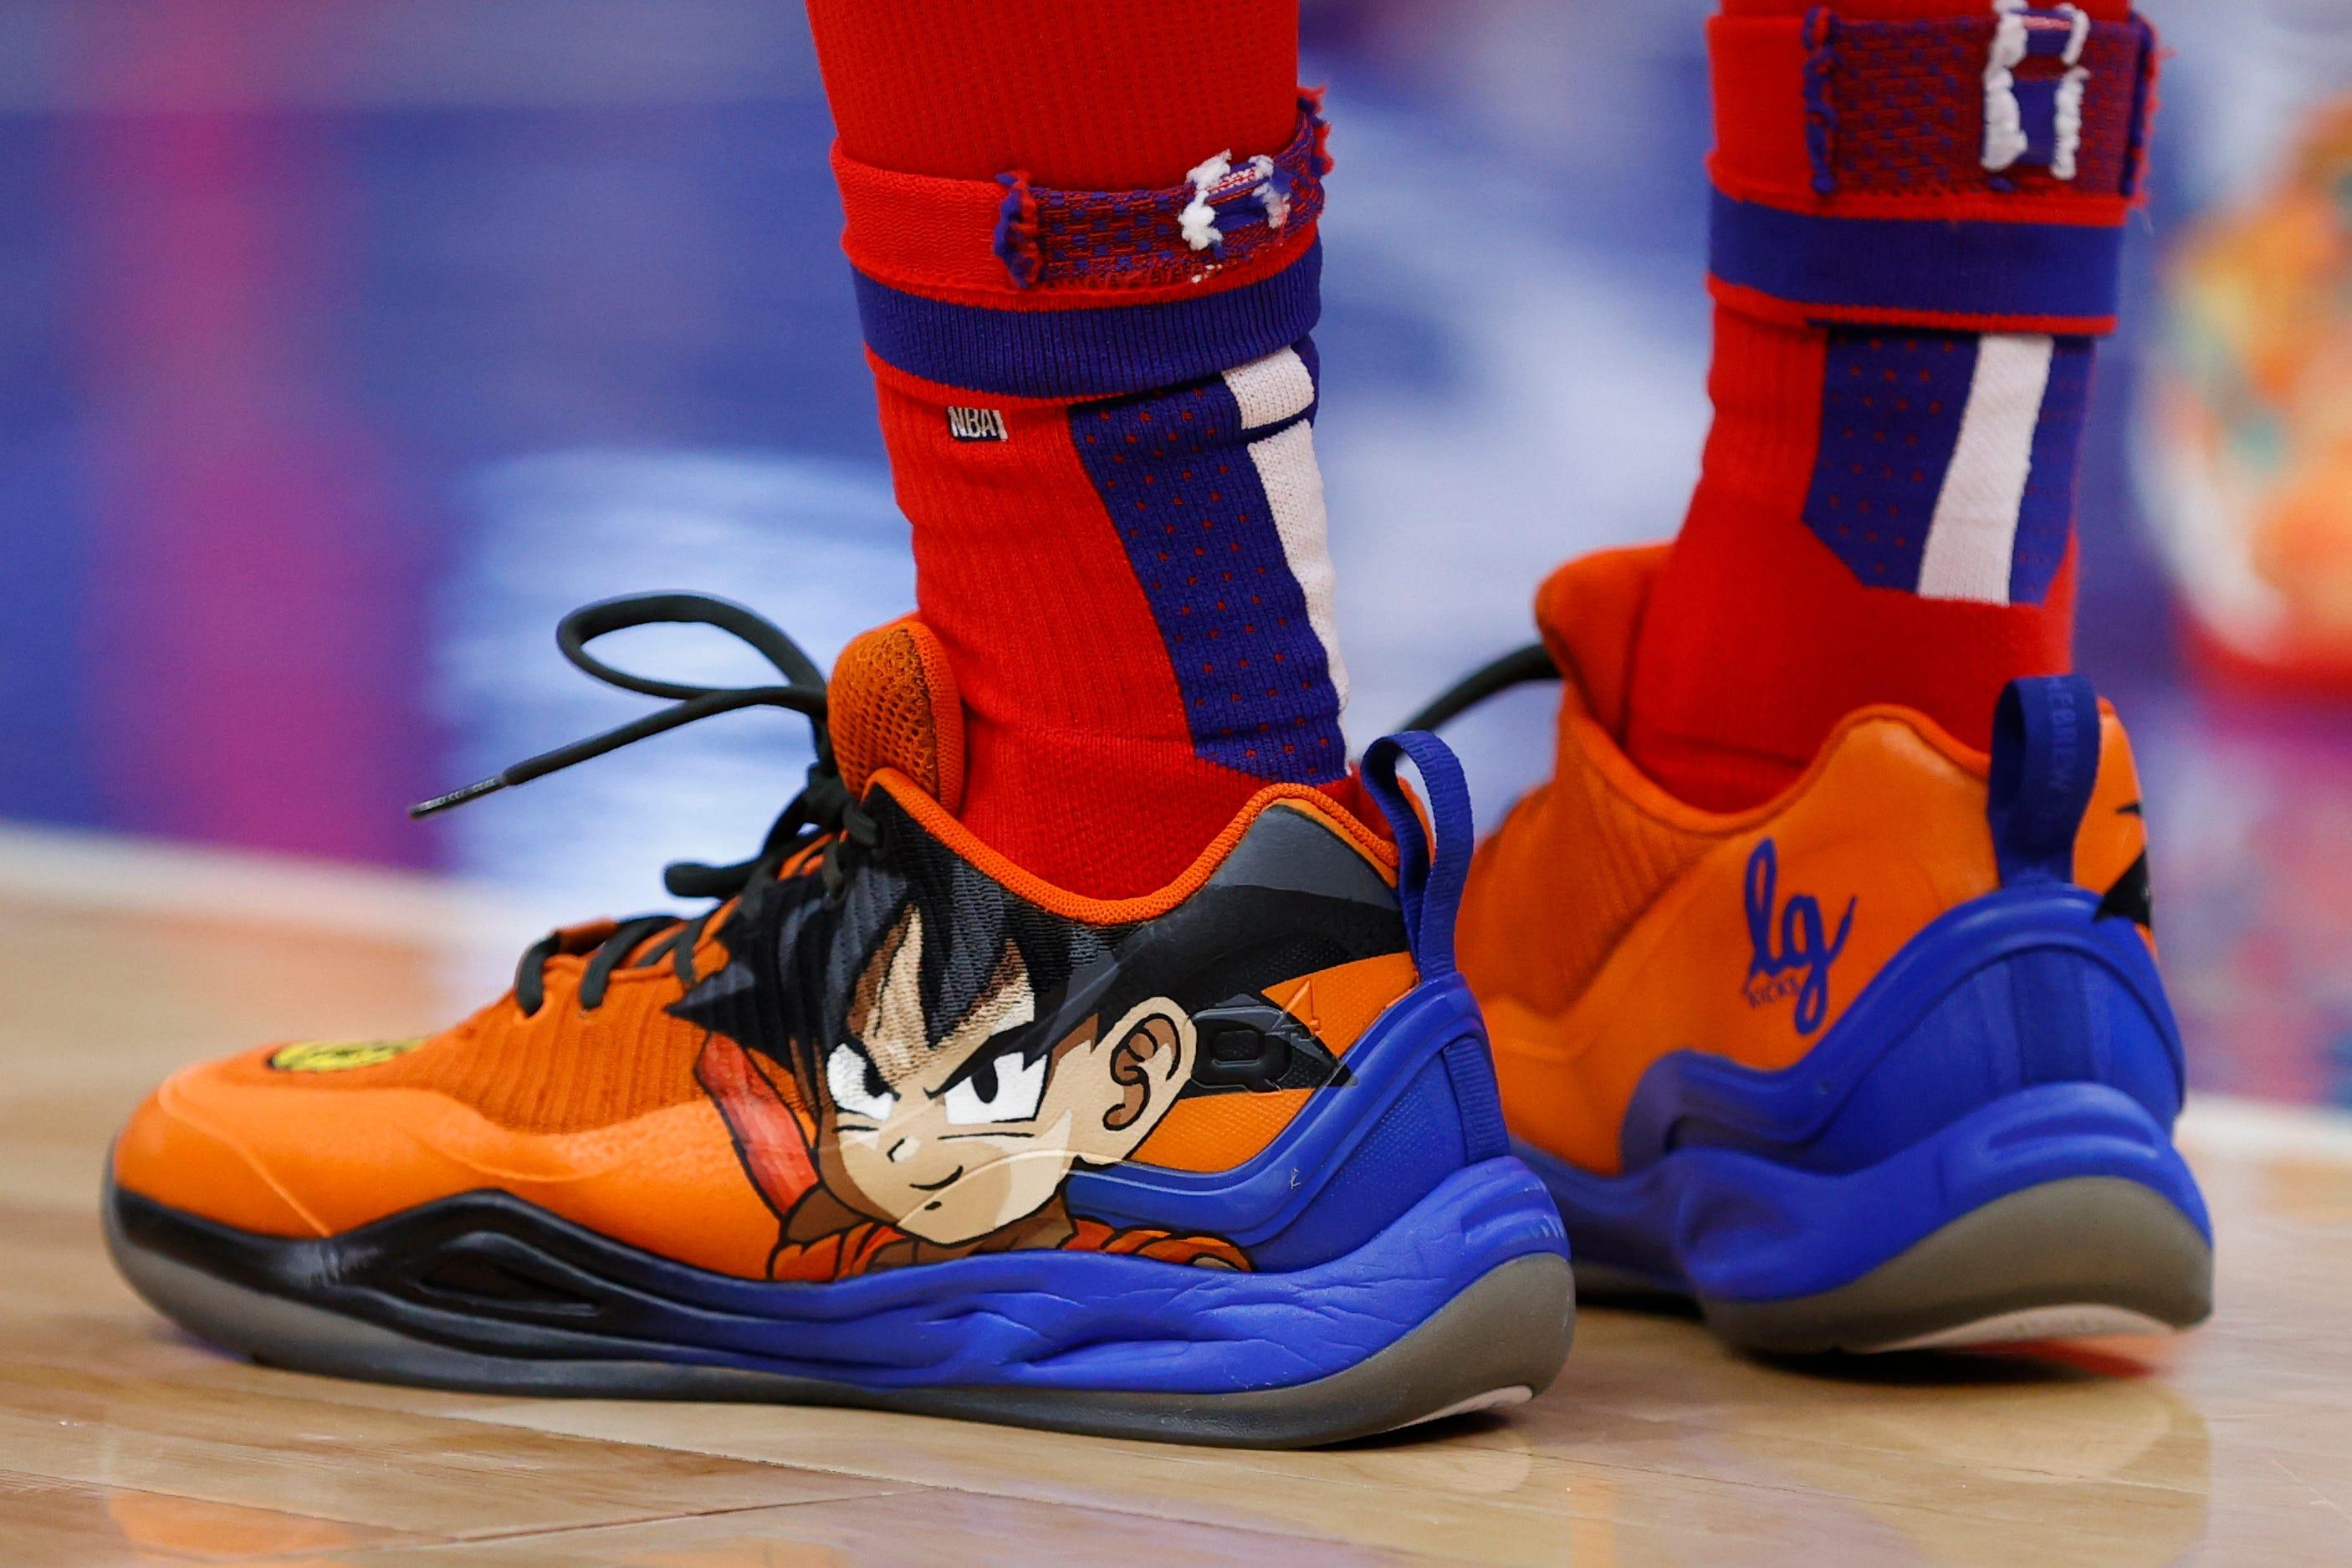 NBA; Coolest shoes of the 2019-20 season